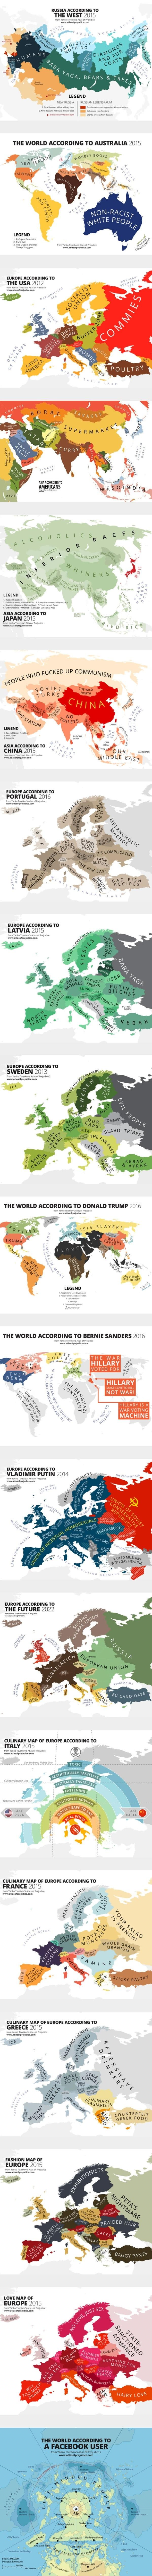 Politically incorrect world map